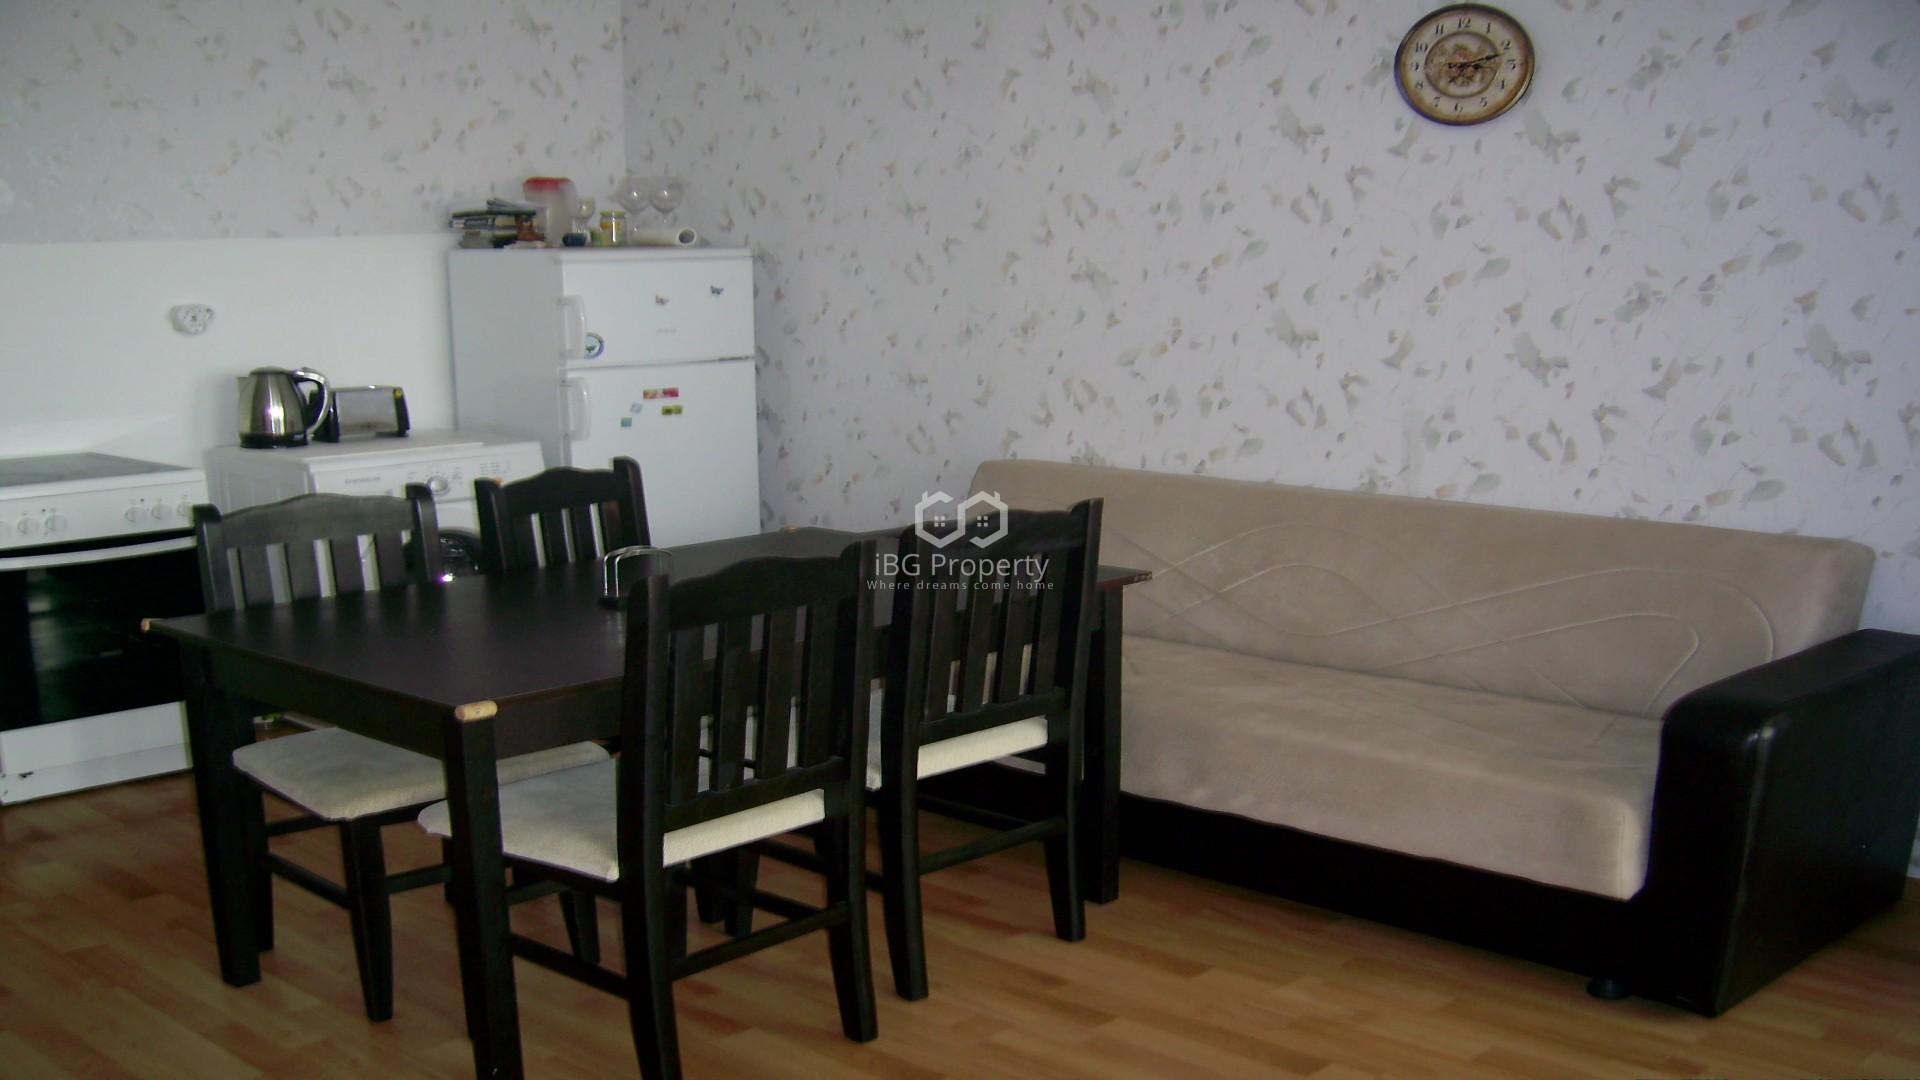 Двухкомнатная квартира Кошарица 60 m2